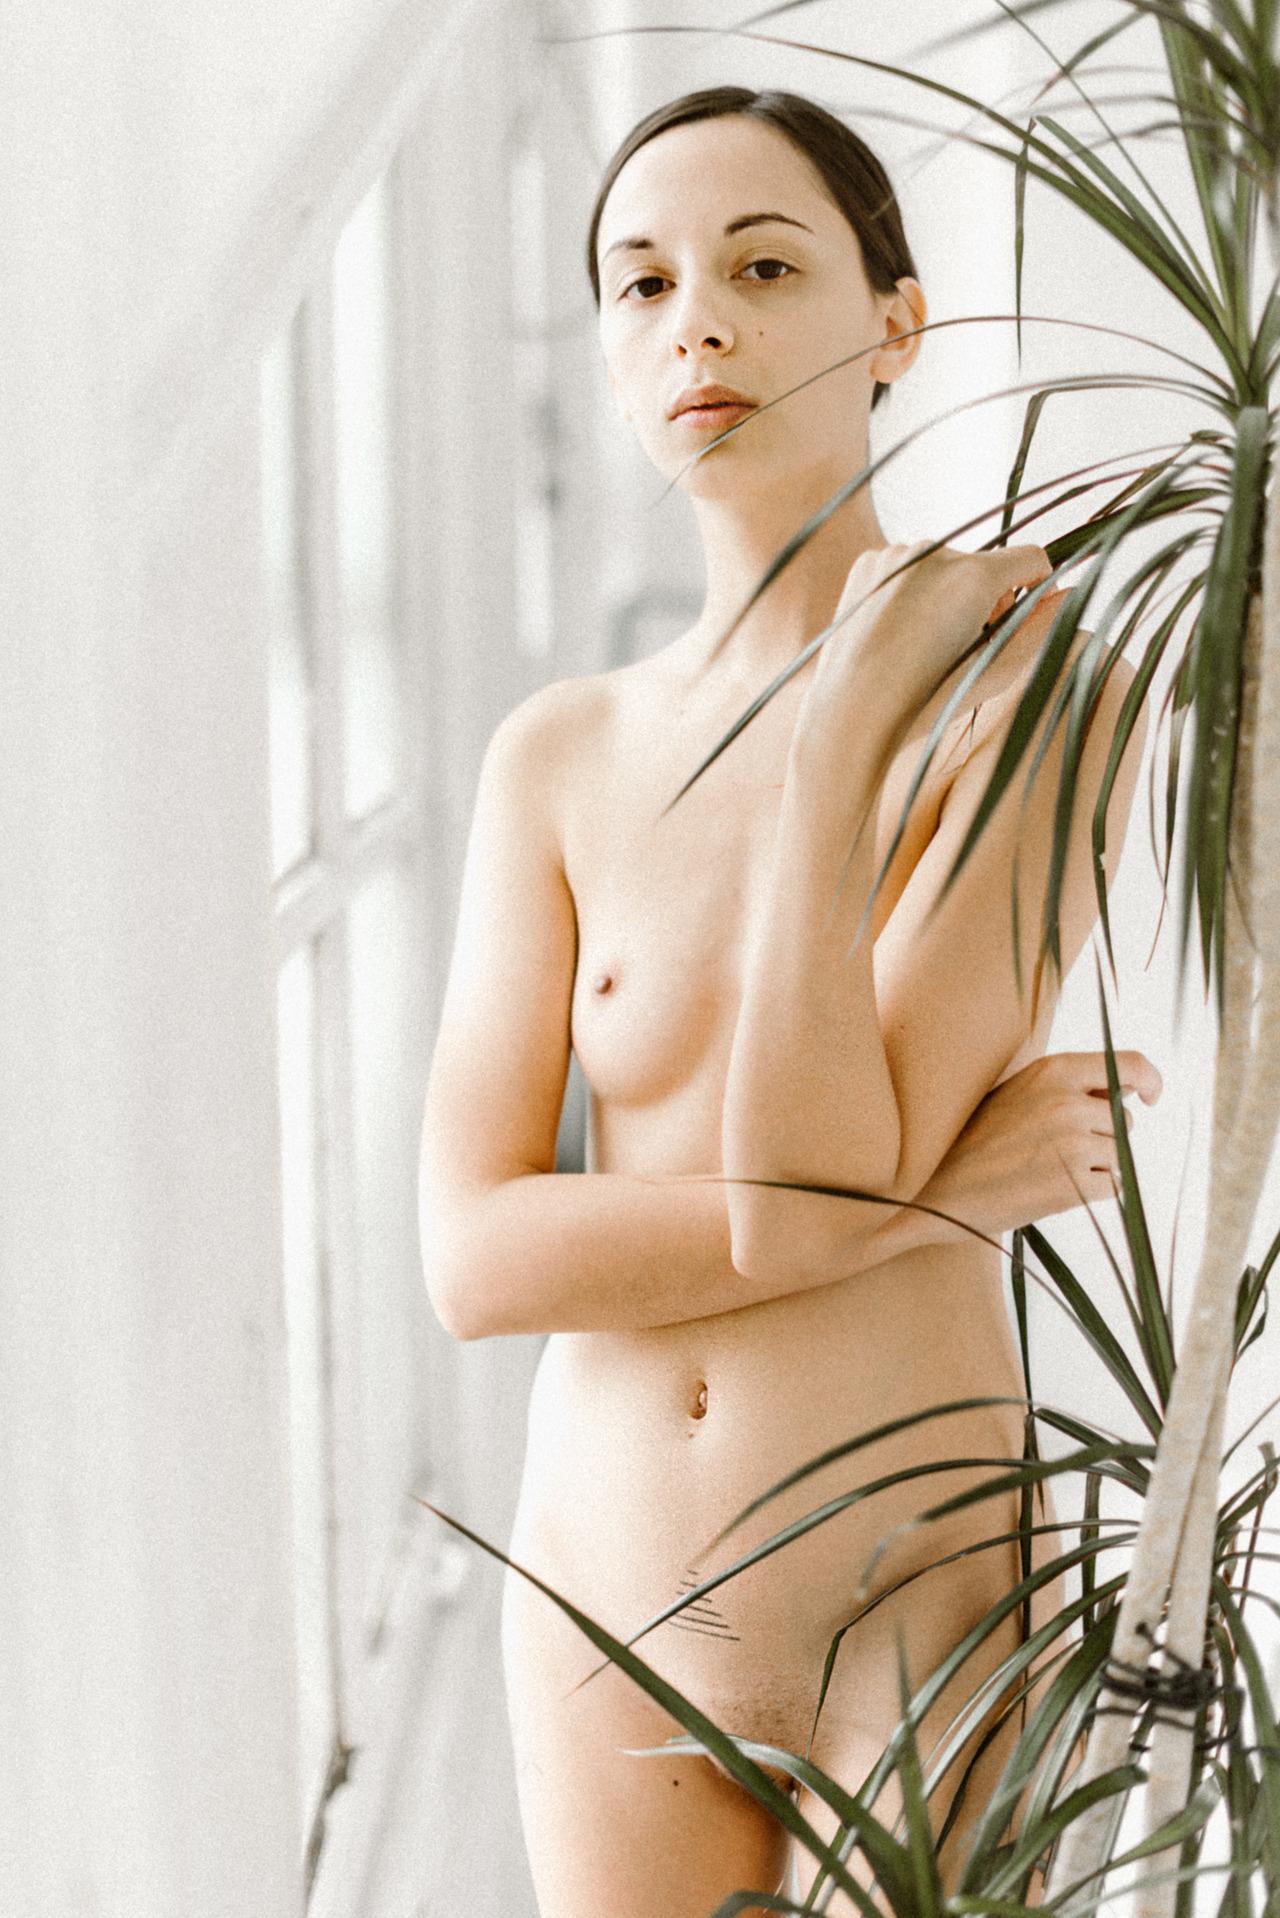 Kara_Neko-Fire_and_Rust-01-osemag.jpg